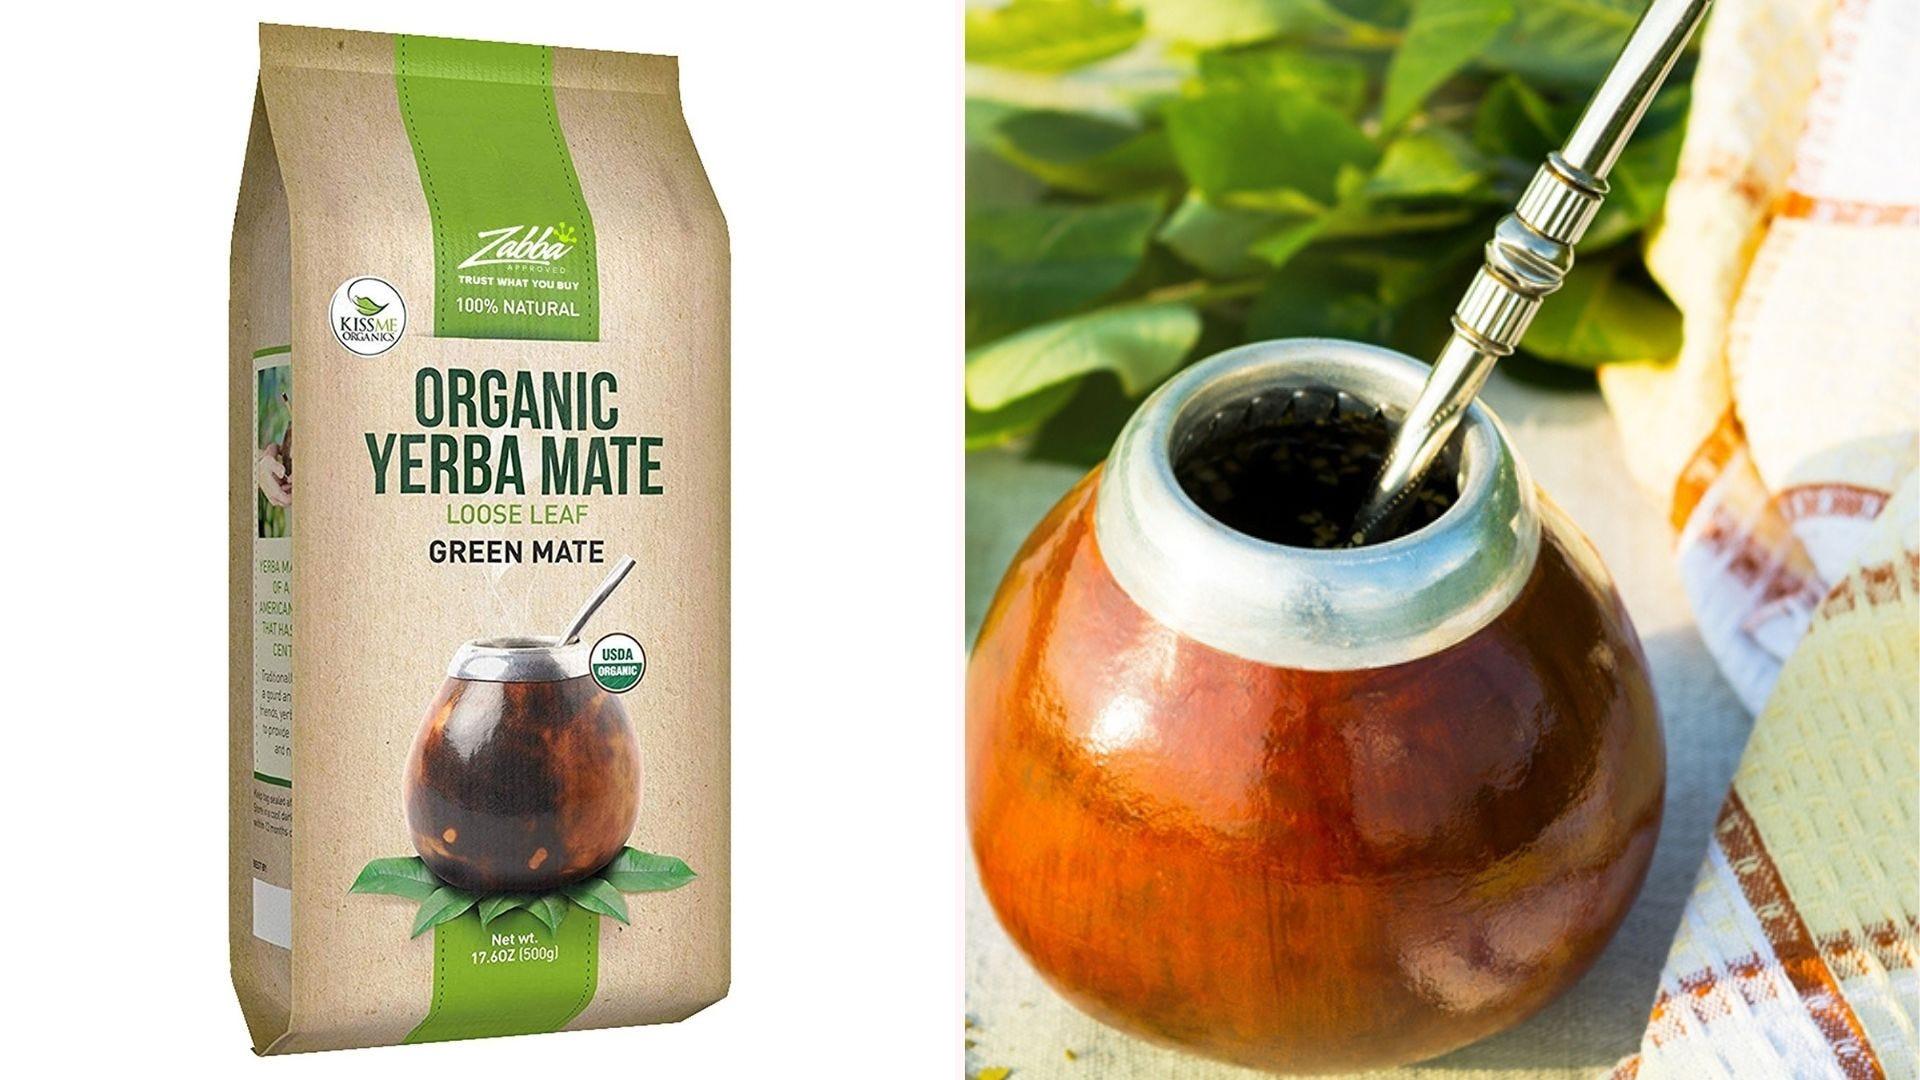 Un paquete de yerba mate orgánica con un recipiente para beber tradicional.